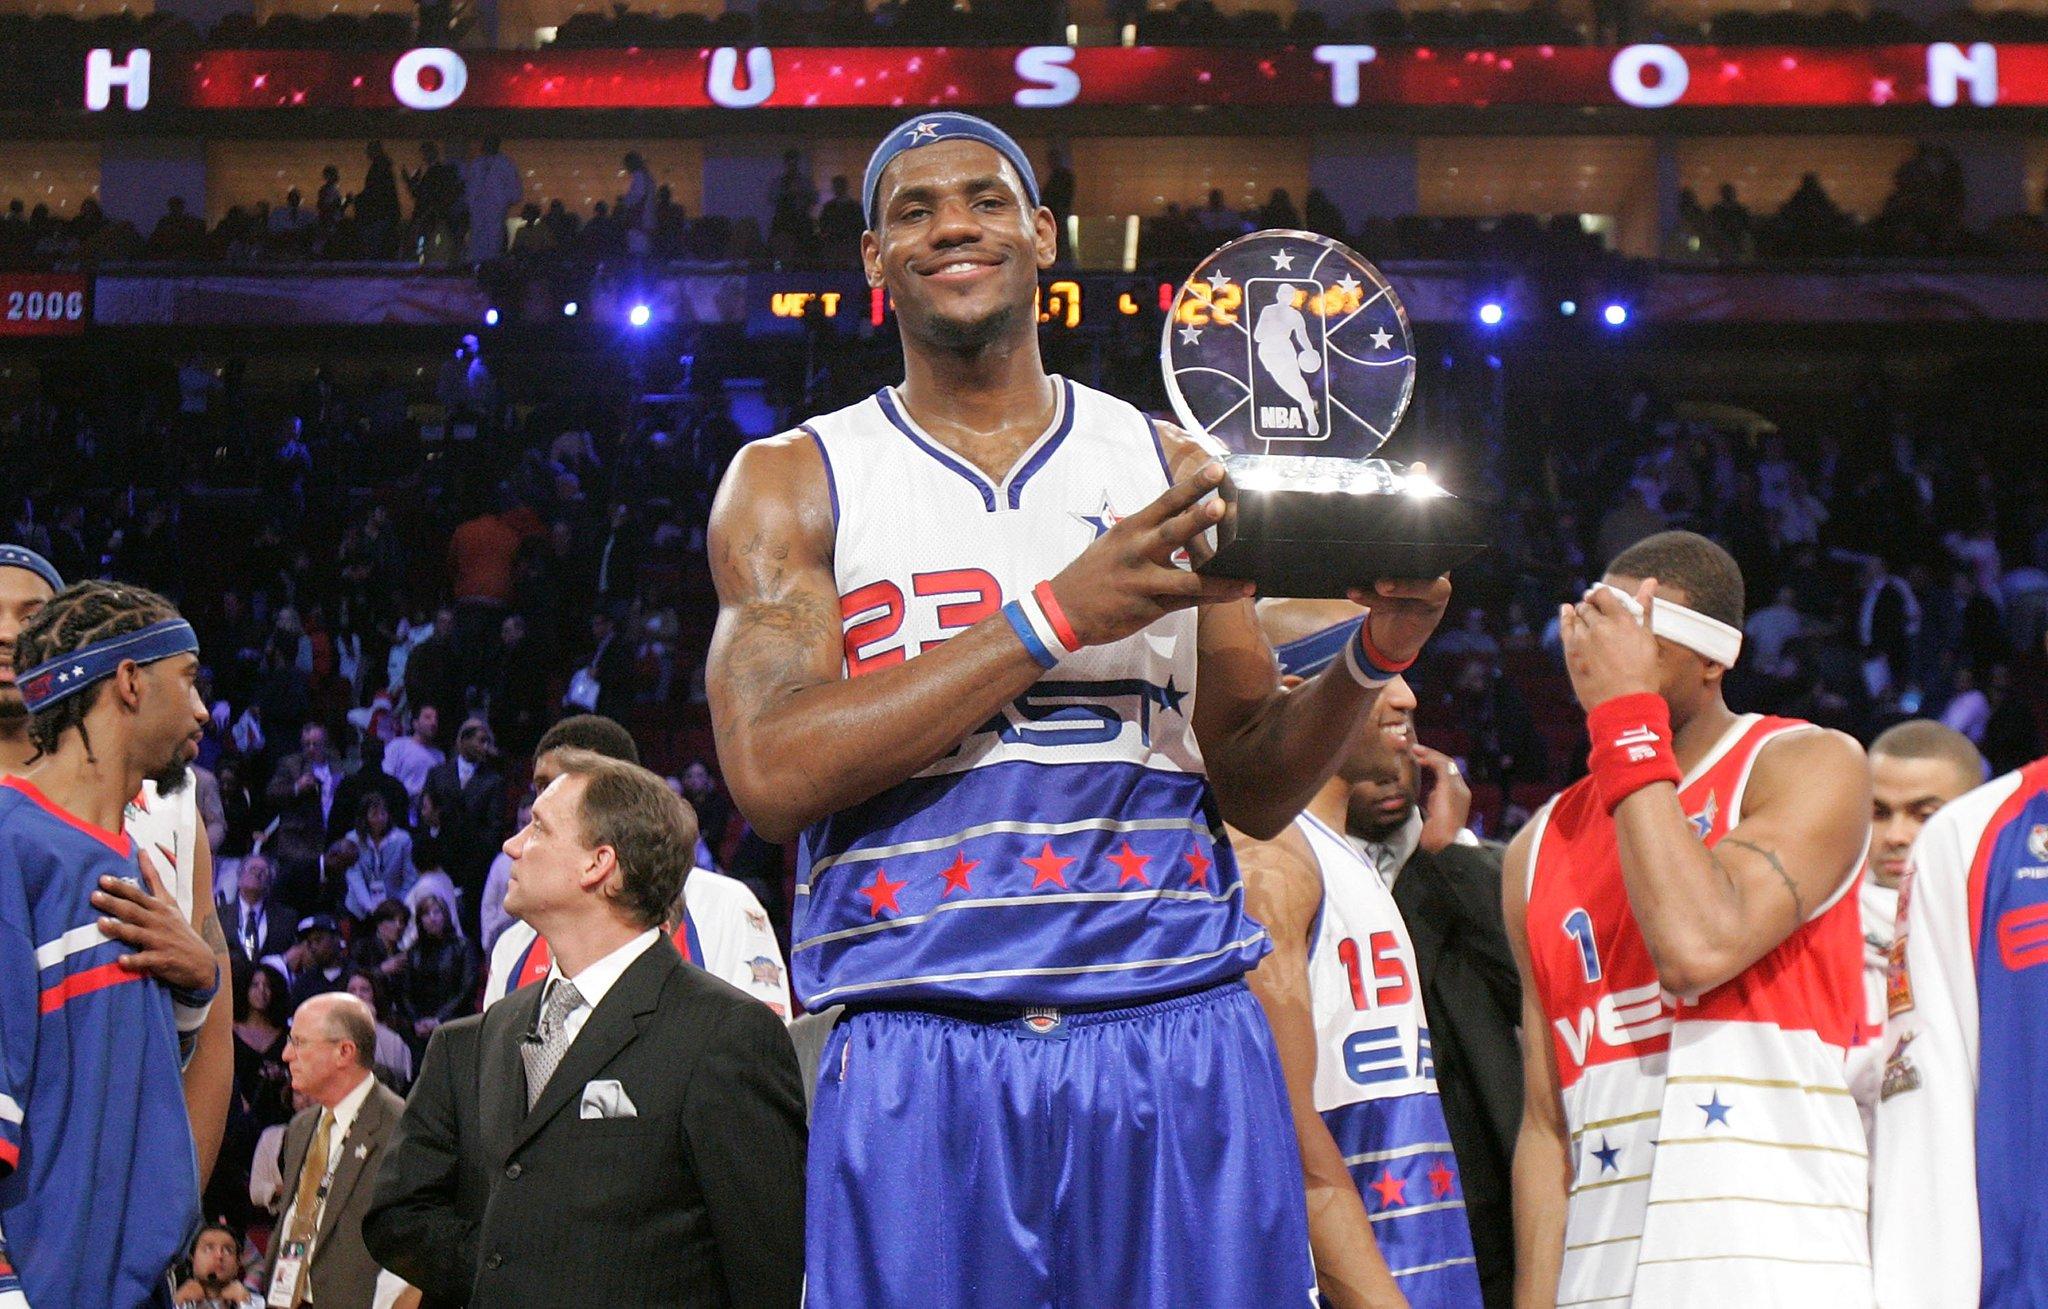 Happy 33rd Birthday to 13x #NBAAllStar and 2x #NBAAllStar MVP (2006, 2008)... @KingJames of the @cavs! #NBABDAY https://t.co/UcT4dI92tE